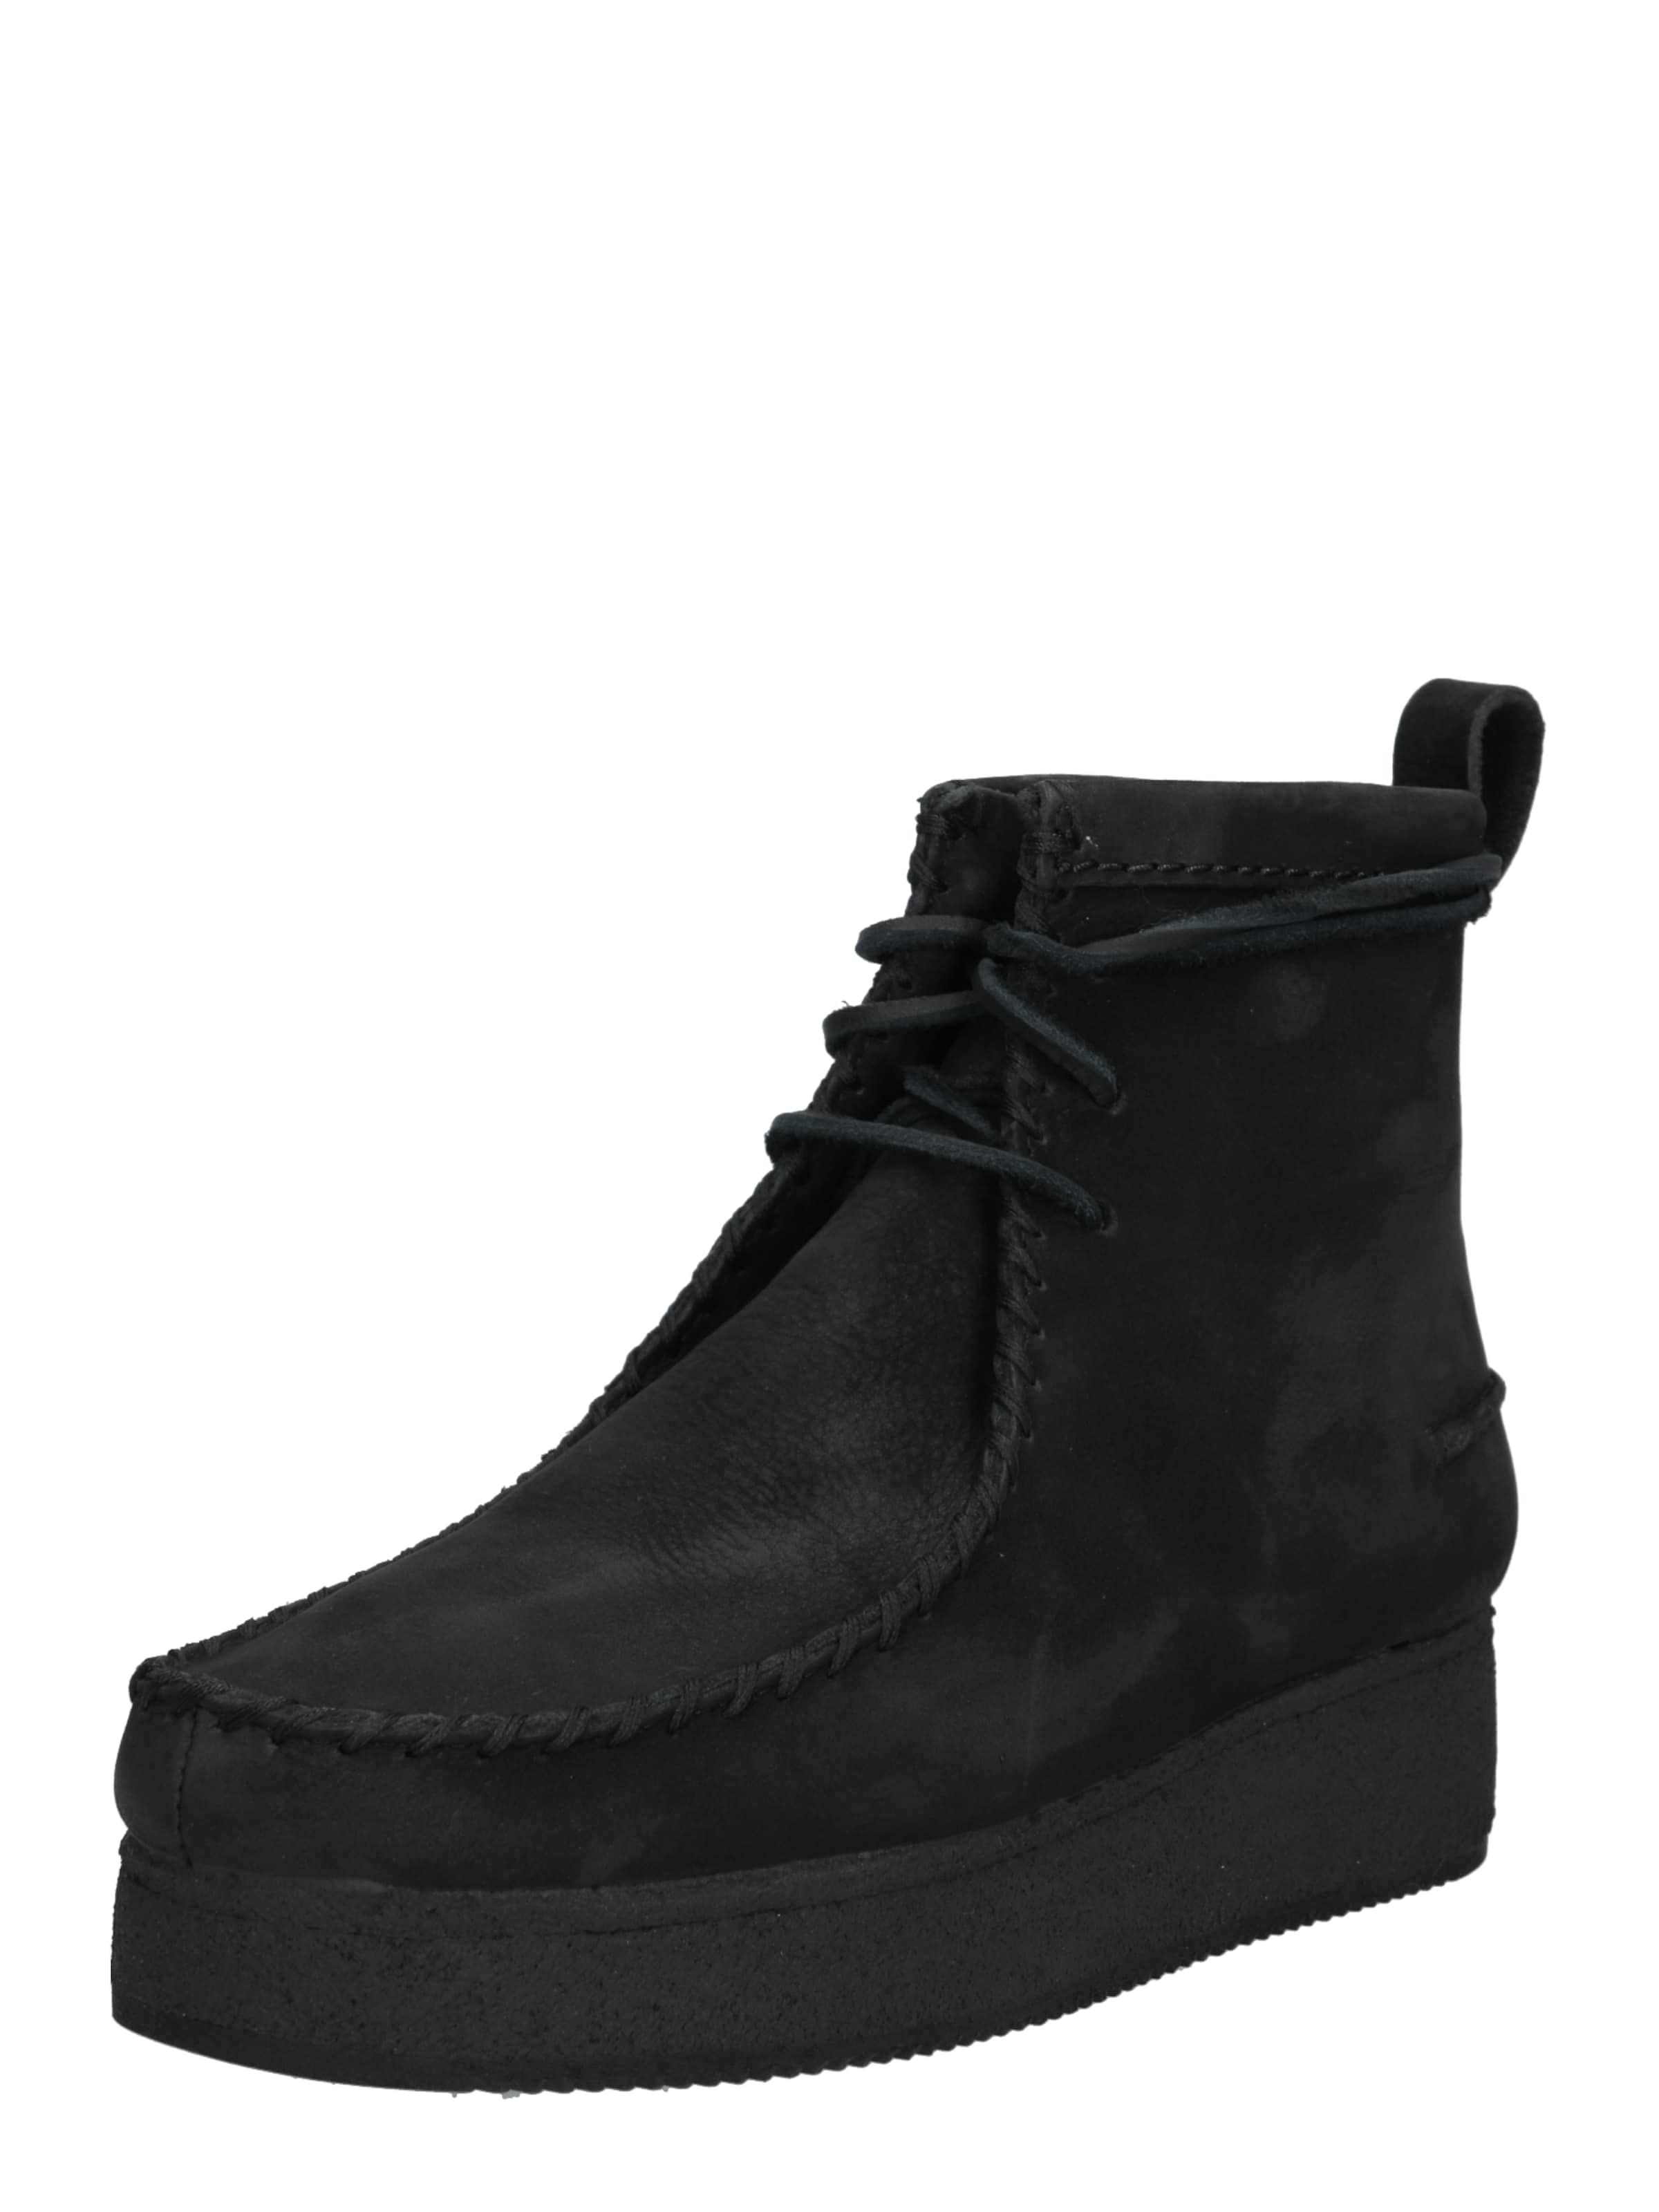 Boots En Craft' Noir Clarks 'wallabee Originals 0wXOk8nP